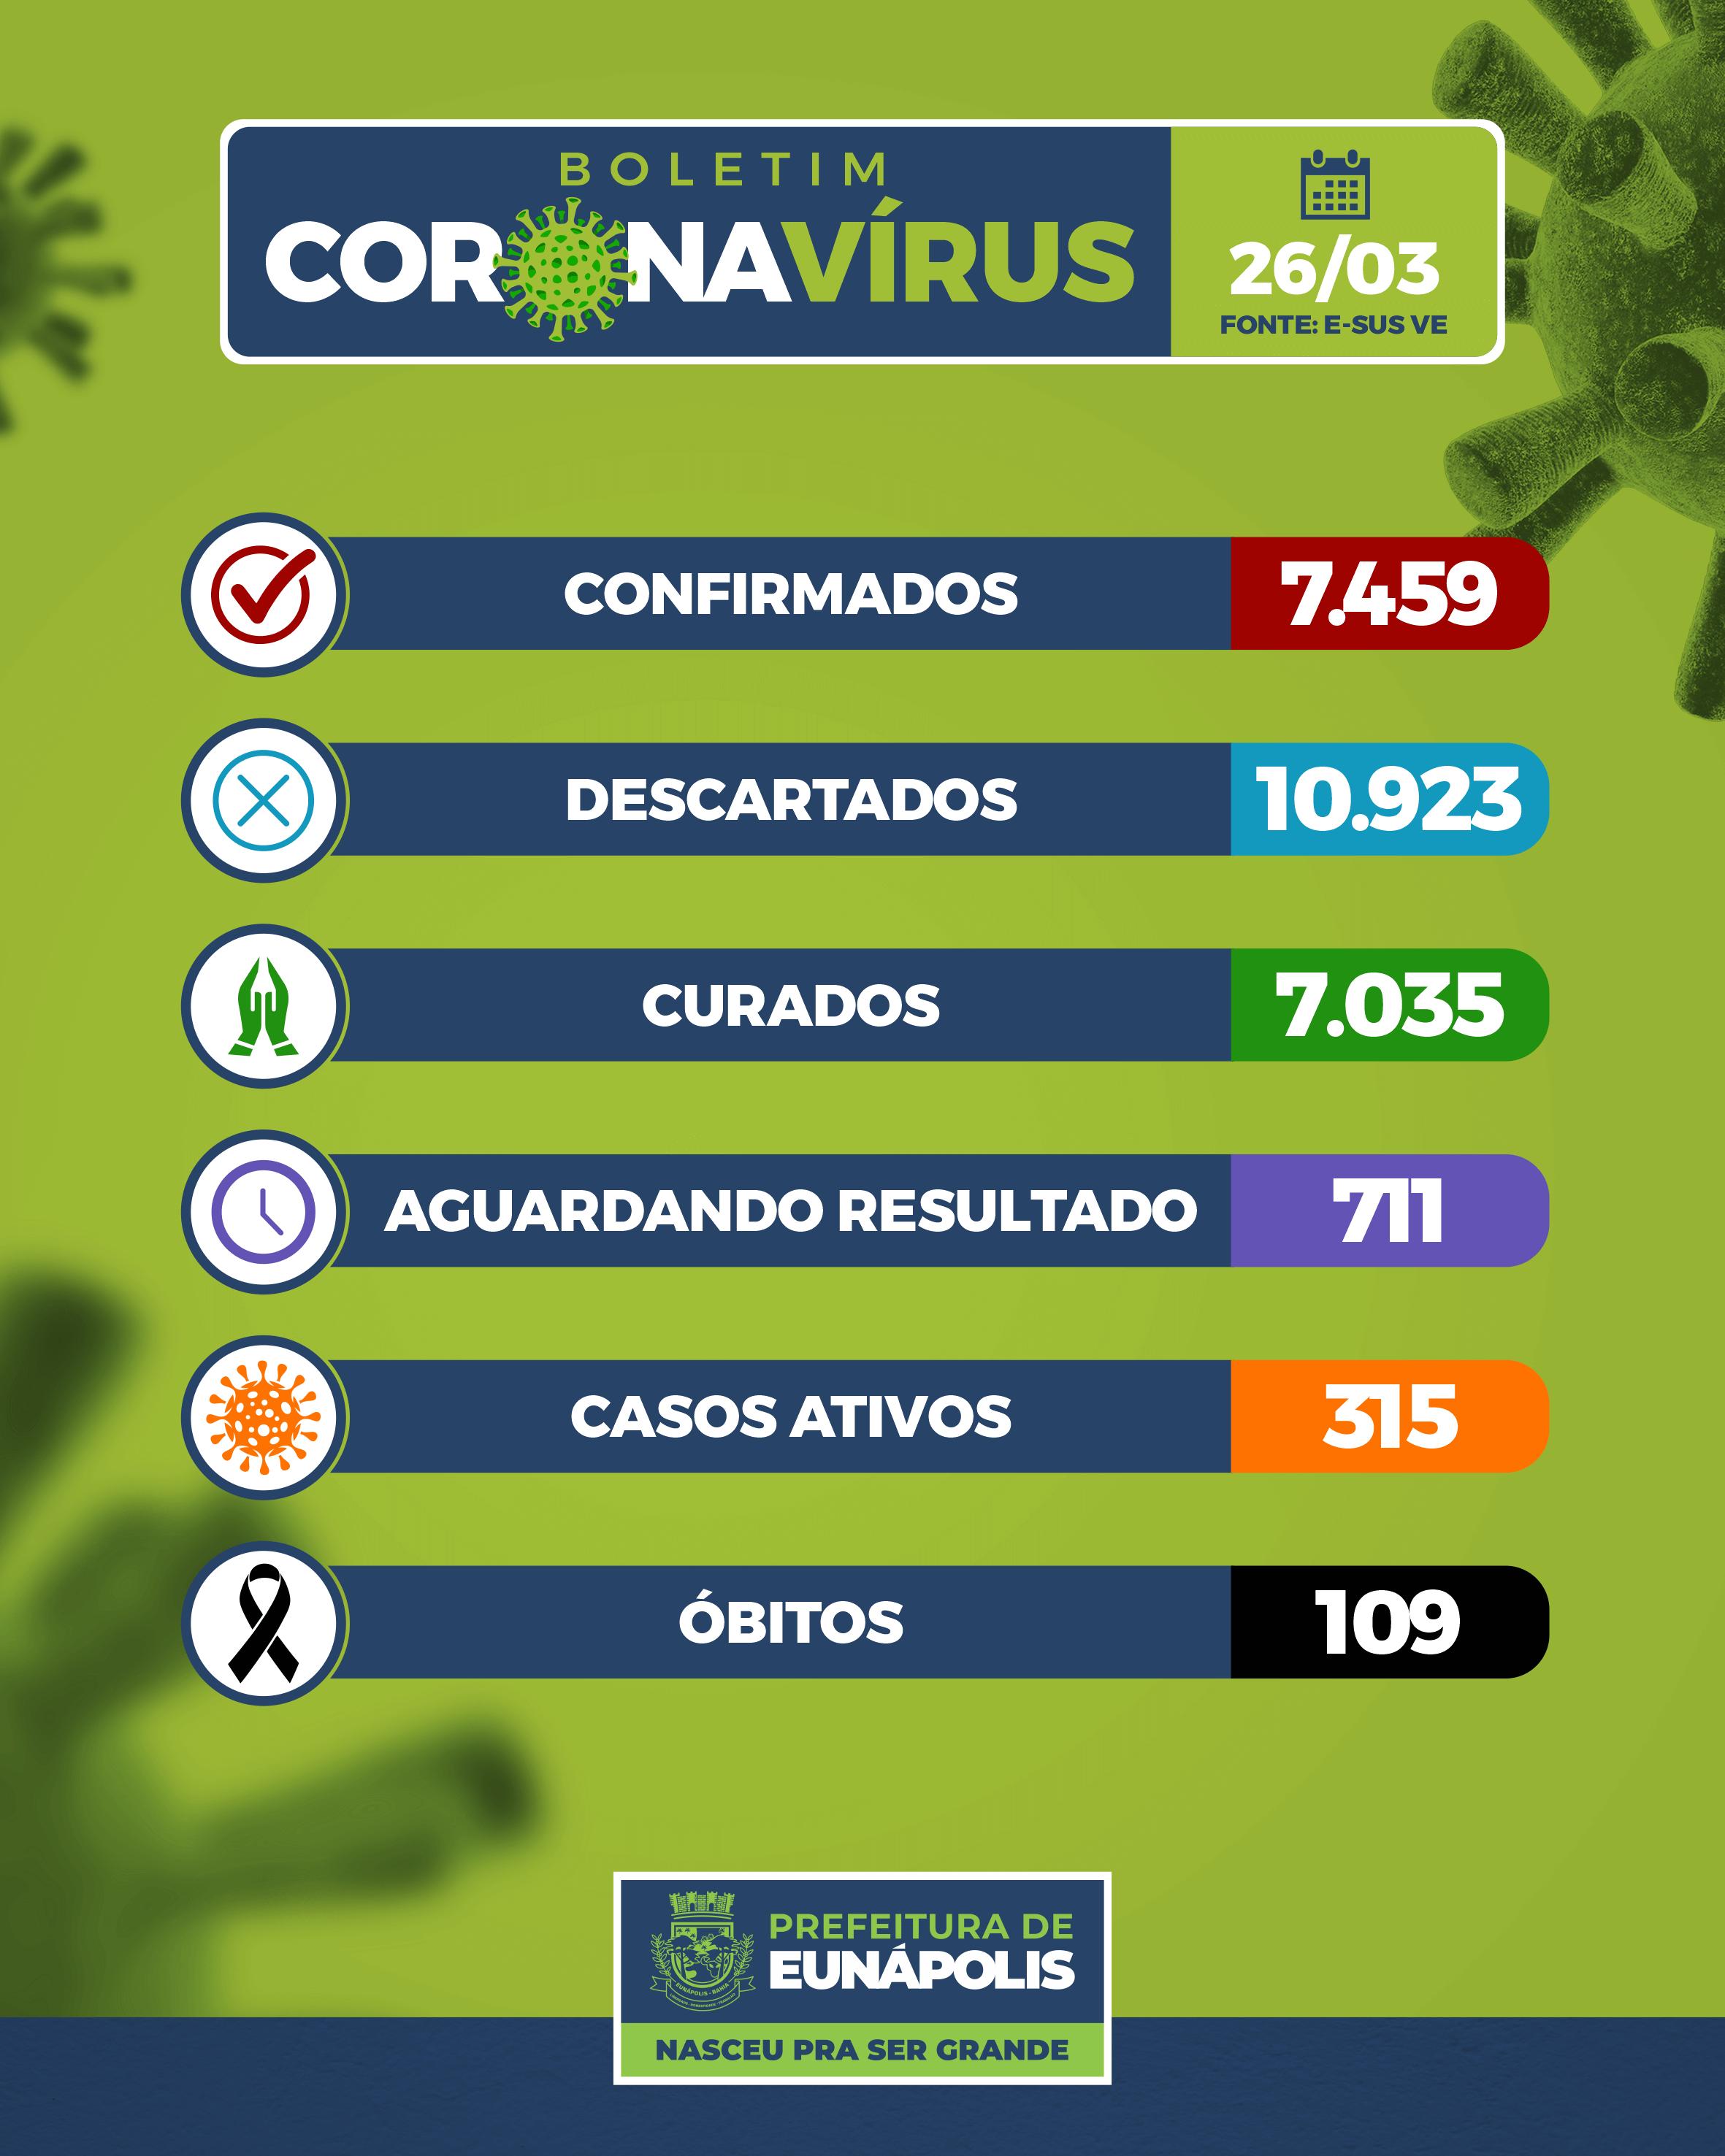 Boletim Epidemiológico Coronavírus do Município de Eunápolis para a data de hoje, 26/03/2021. 18